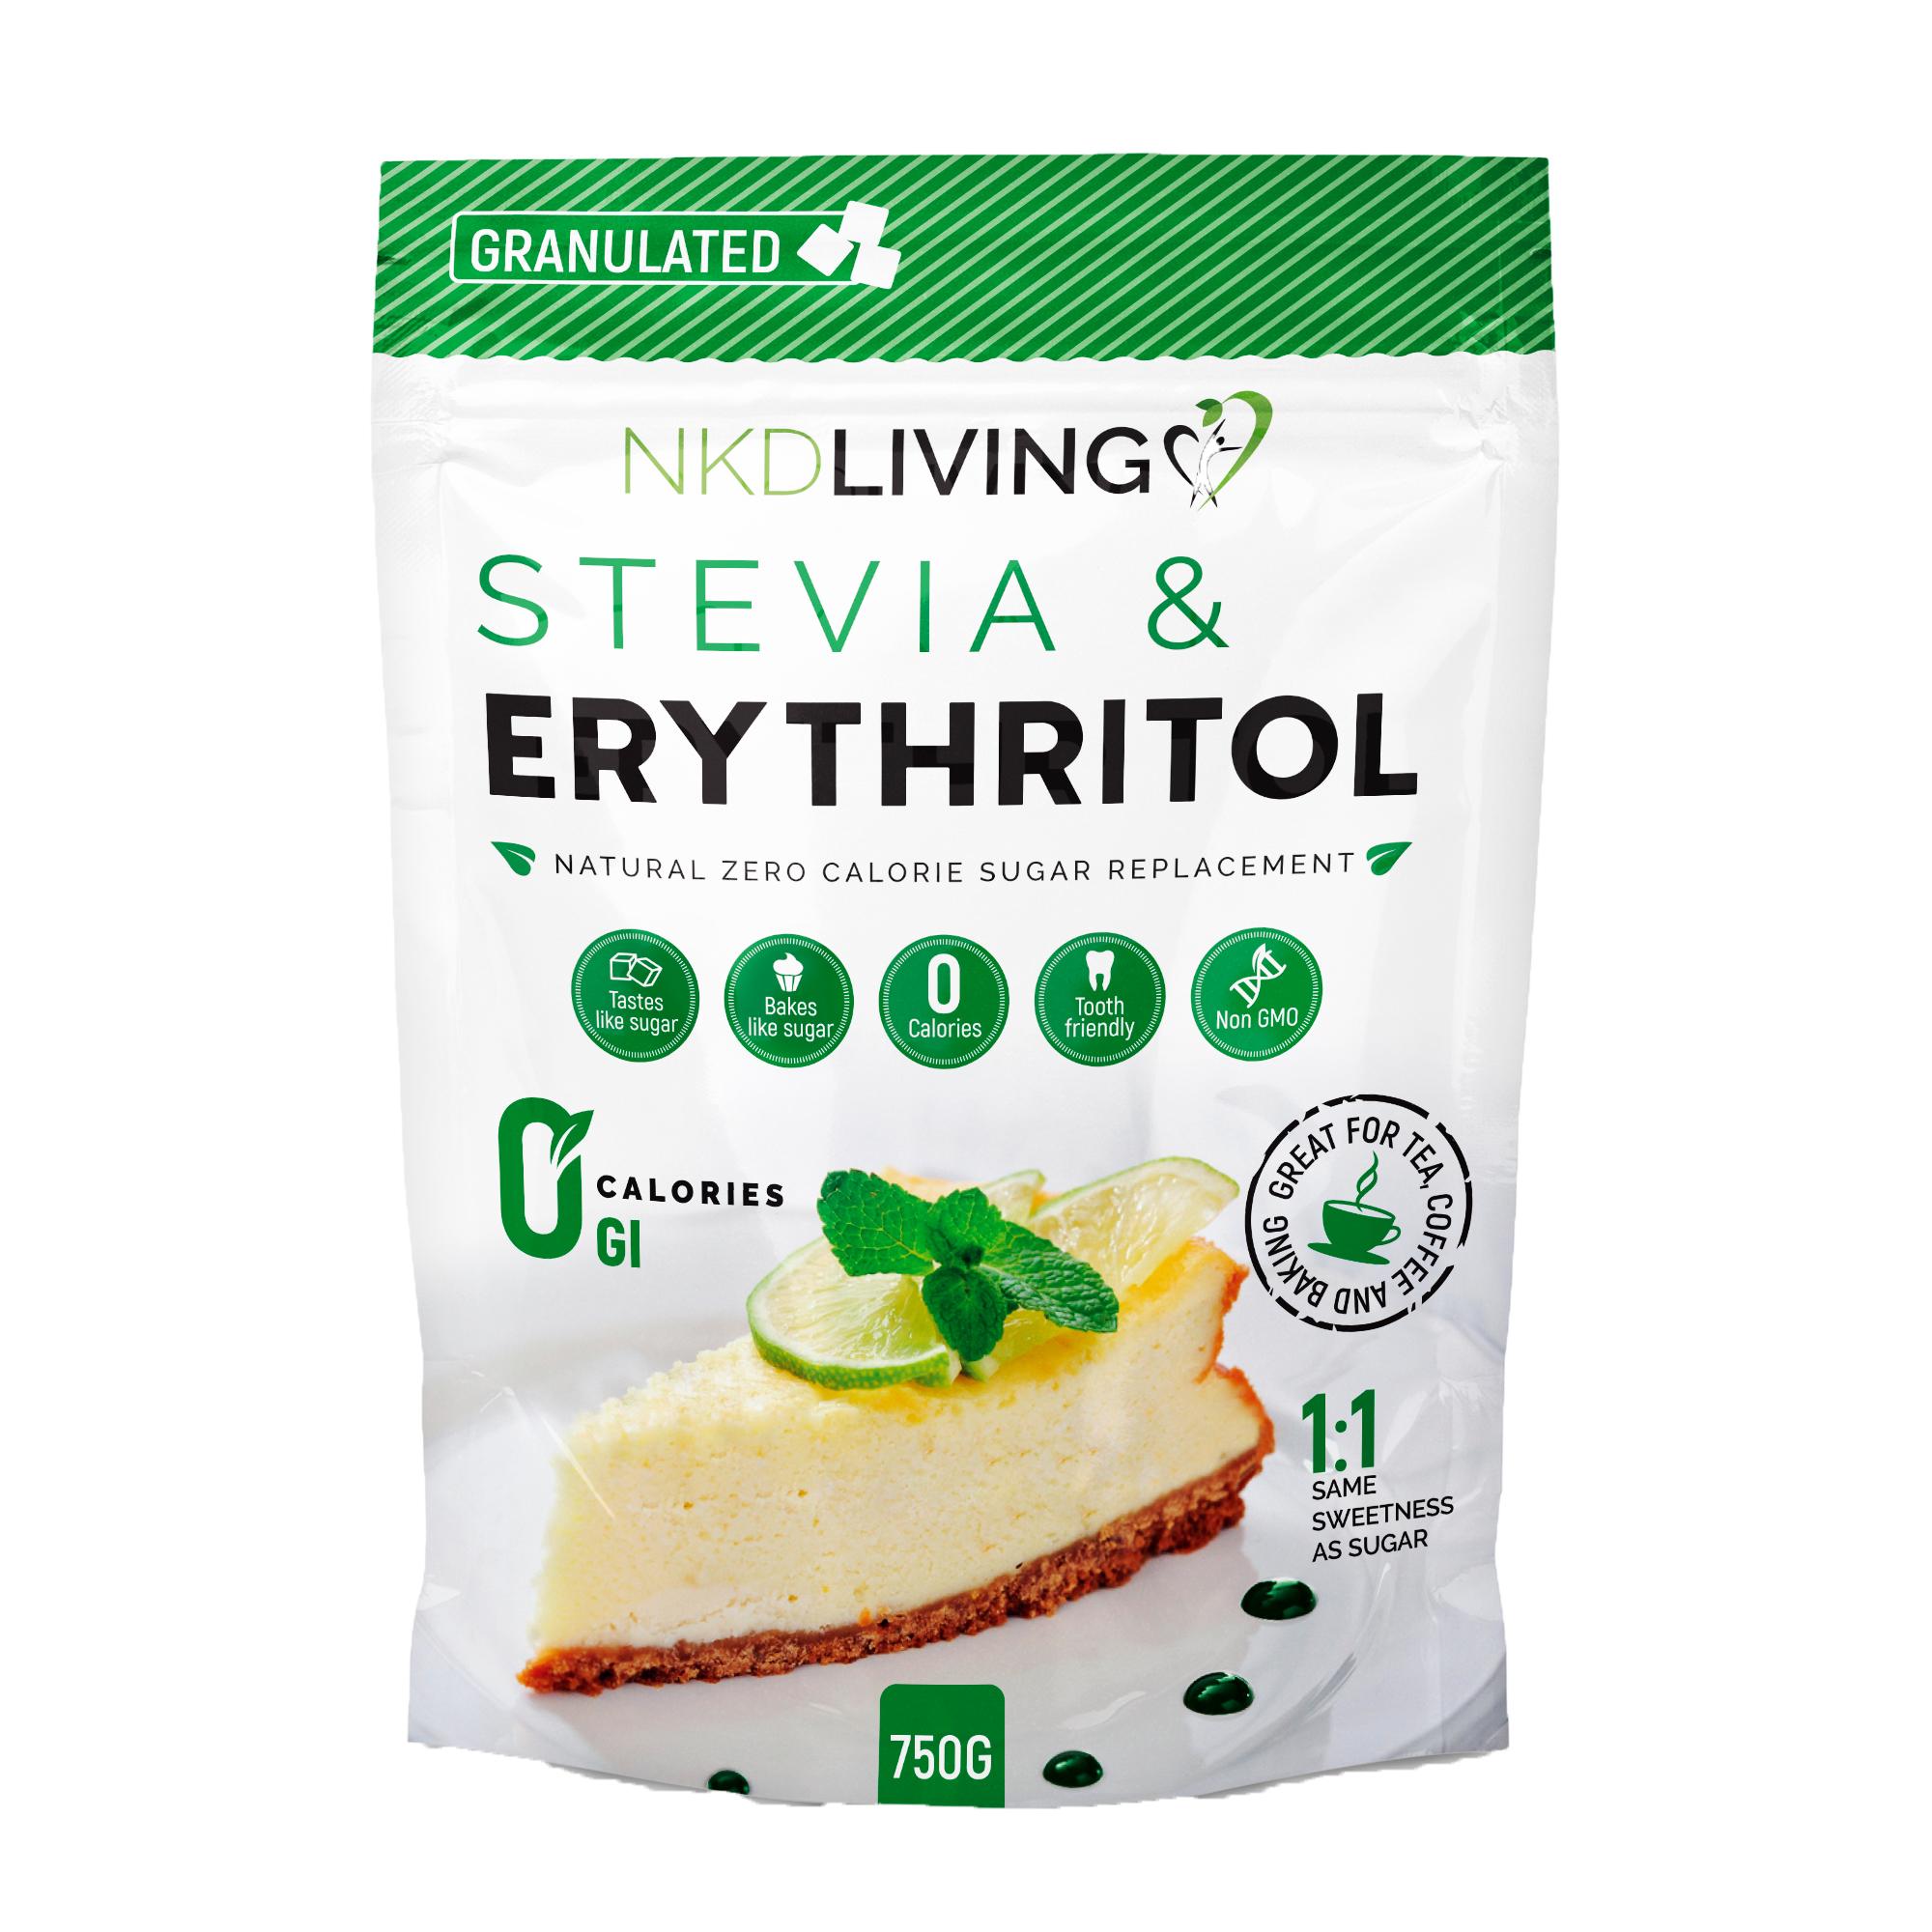 Stevia & Erythritol 1:1 Granulated 750g